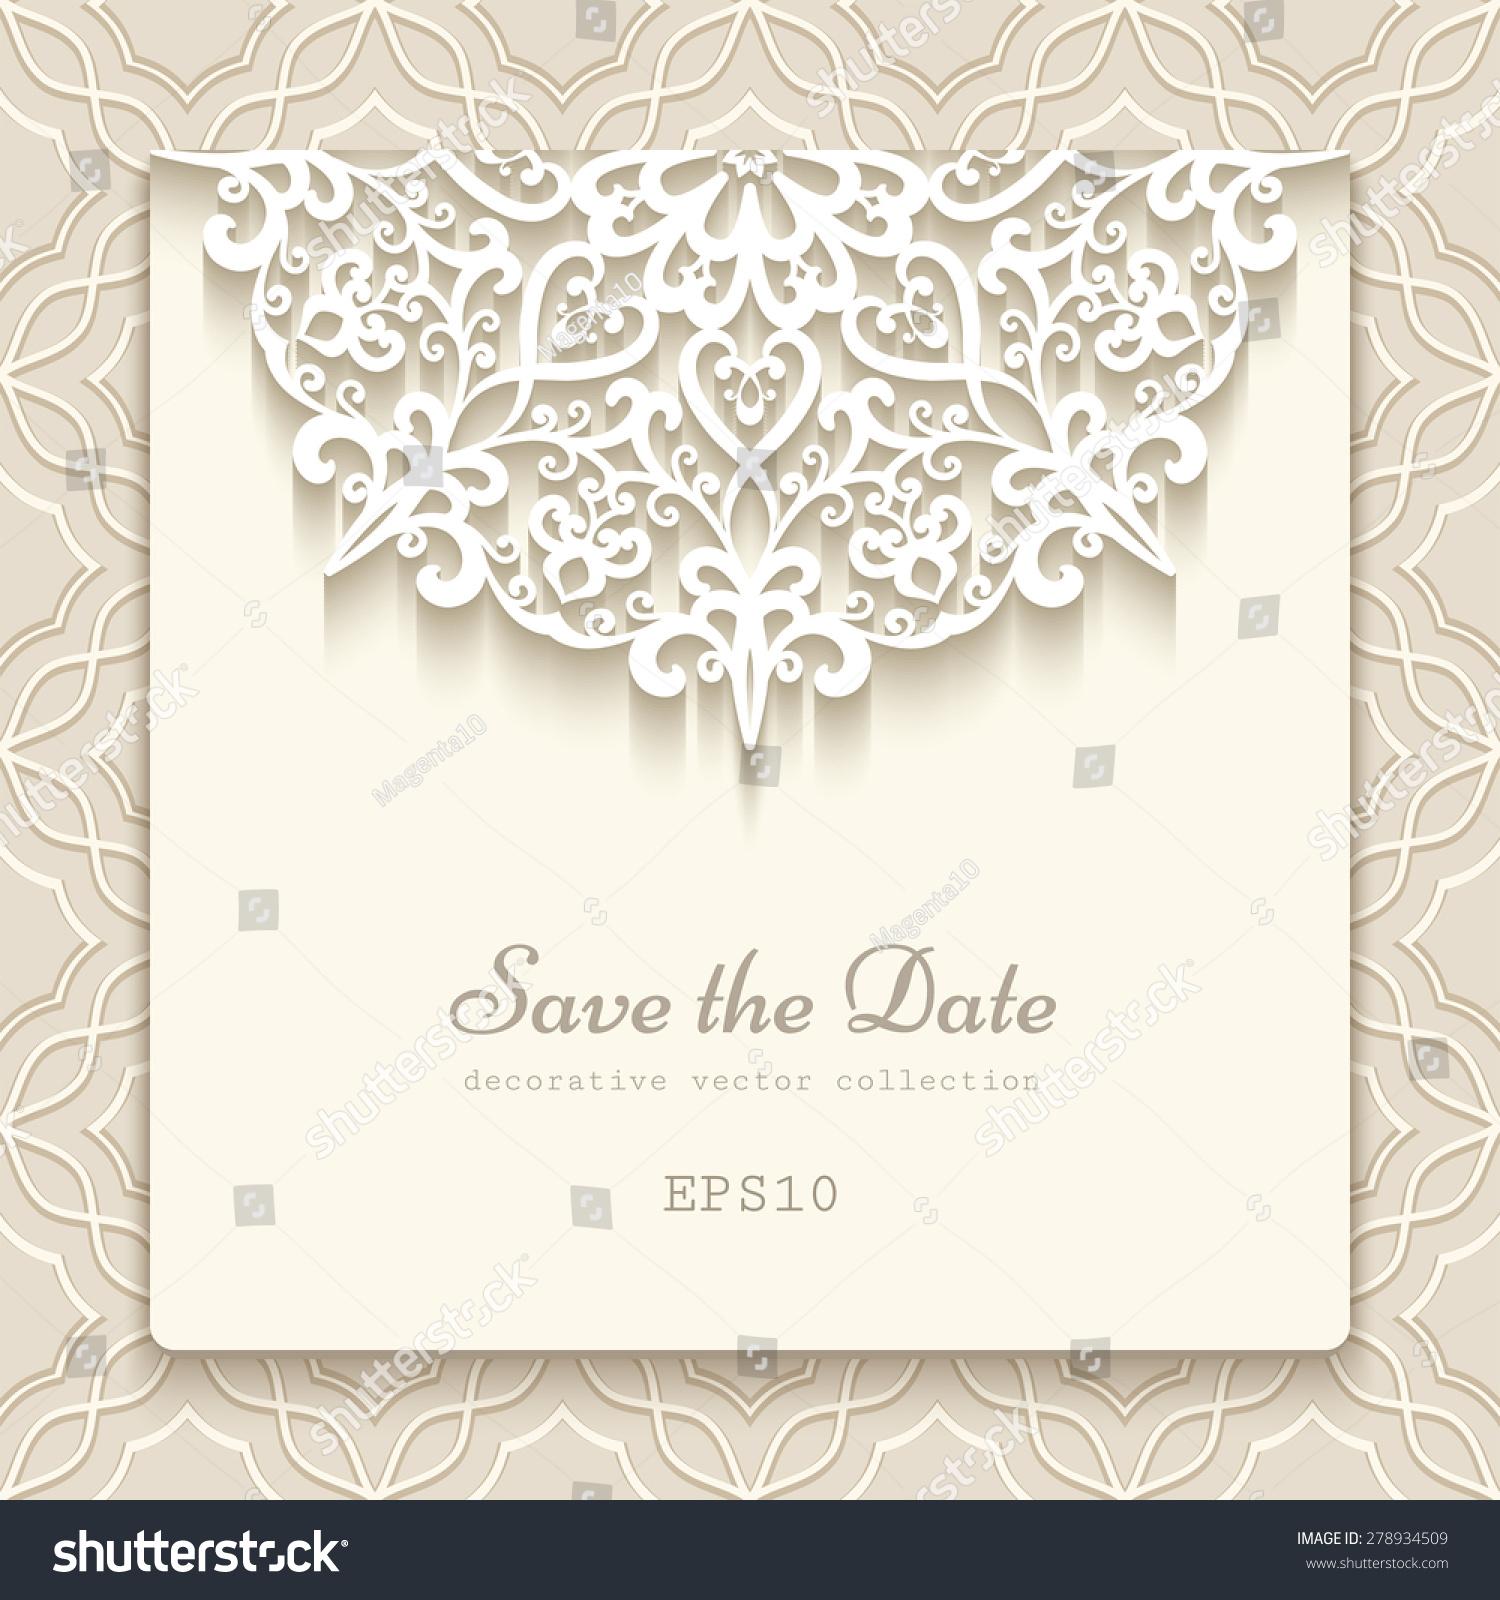 elegant save date card lace decoration のベクター画像素材